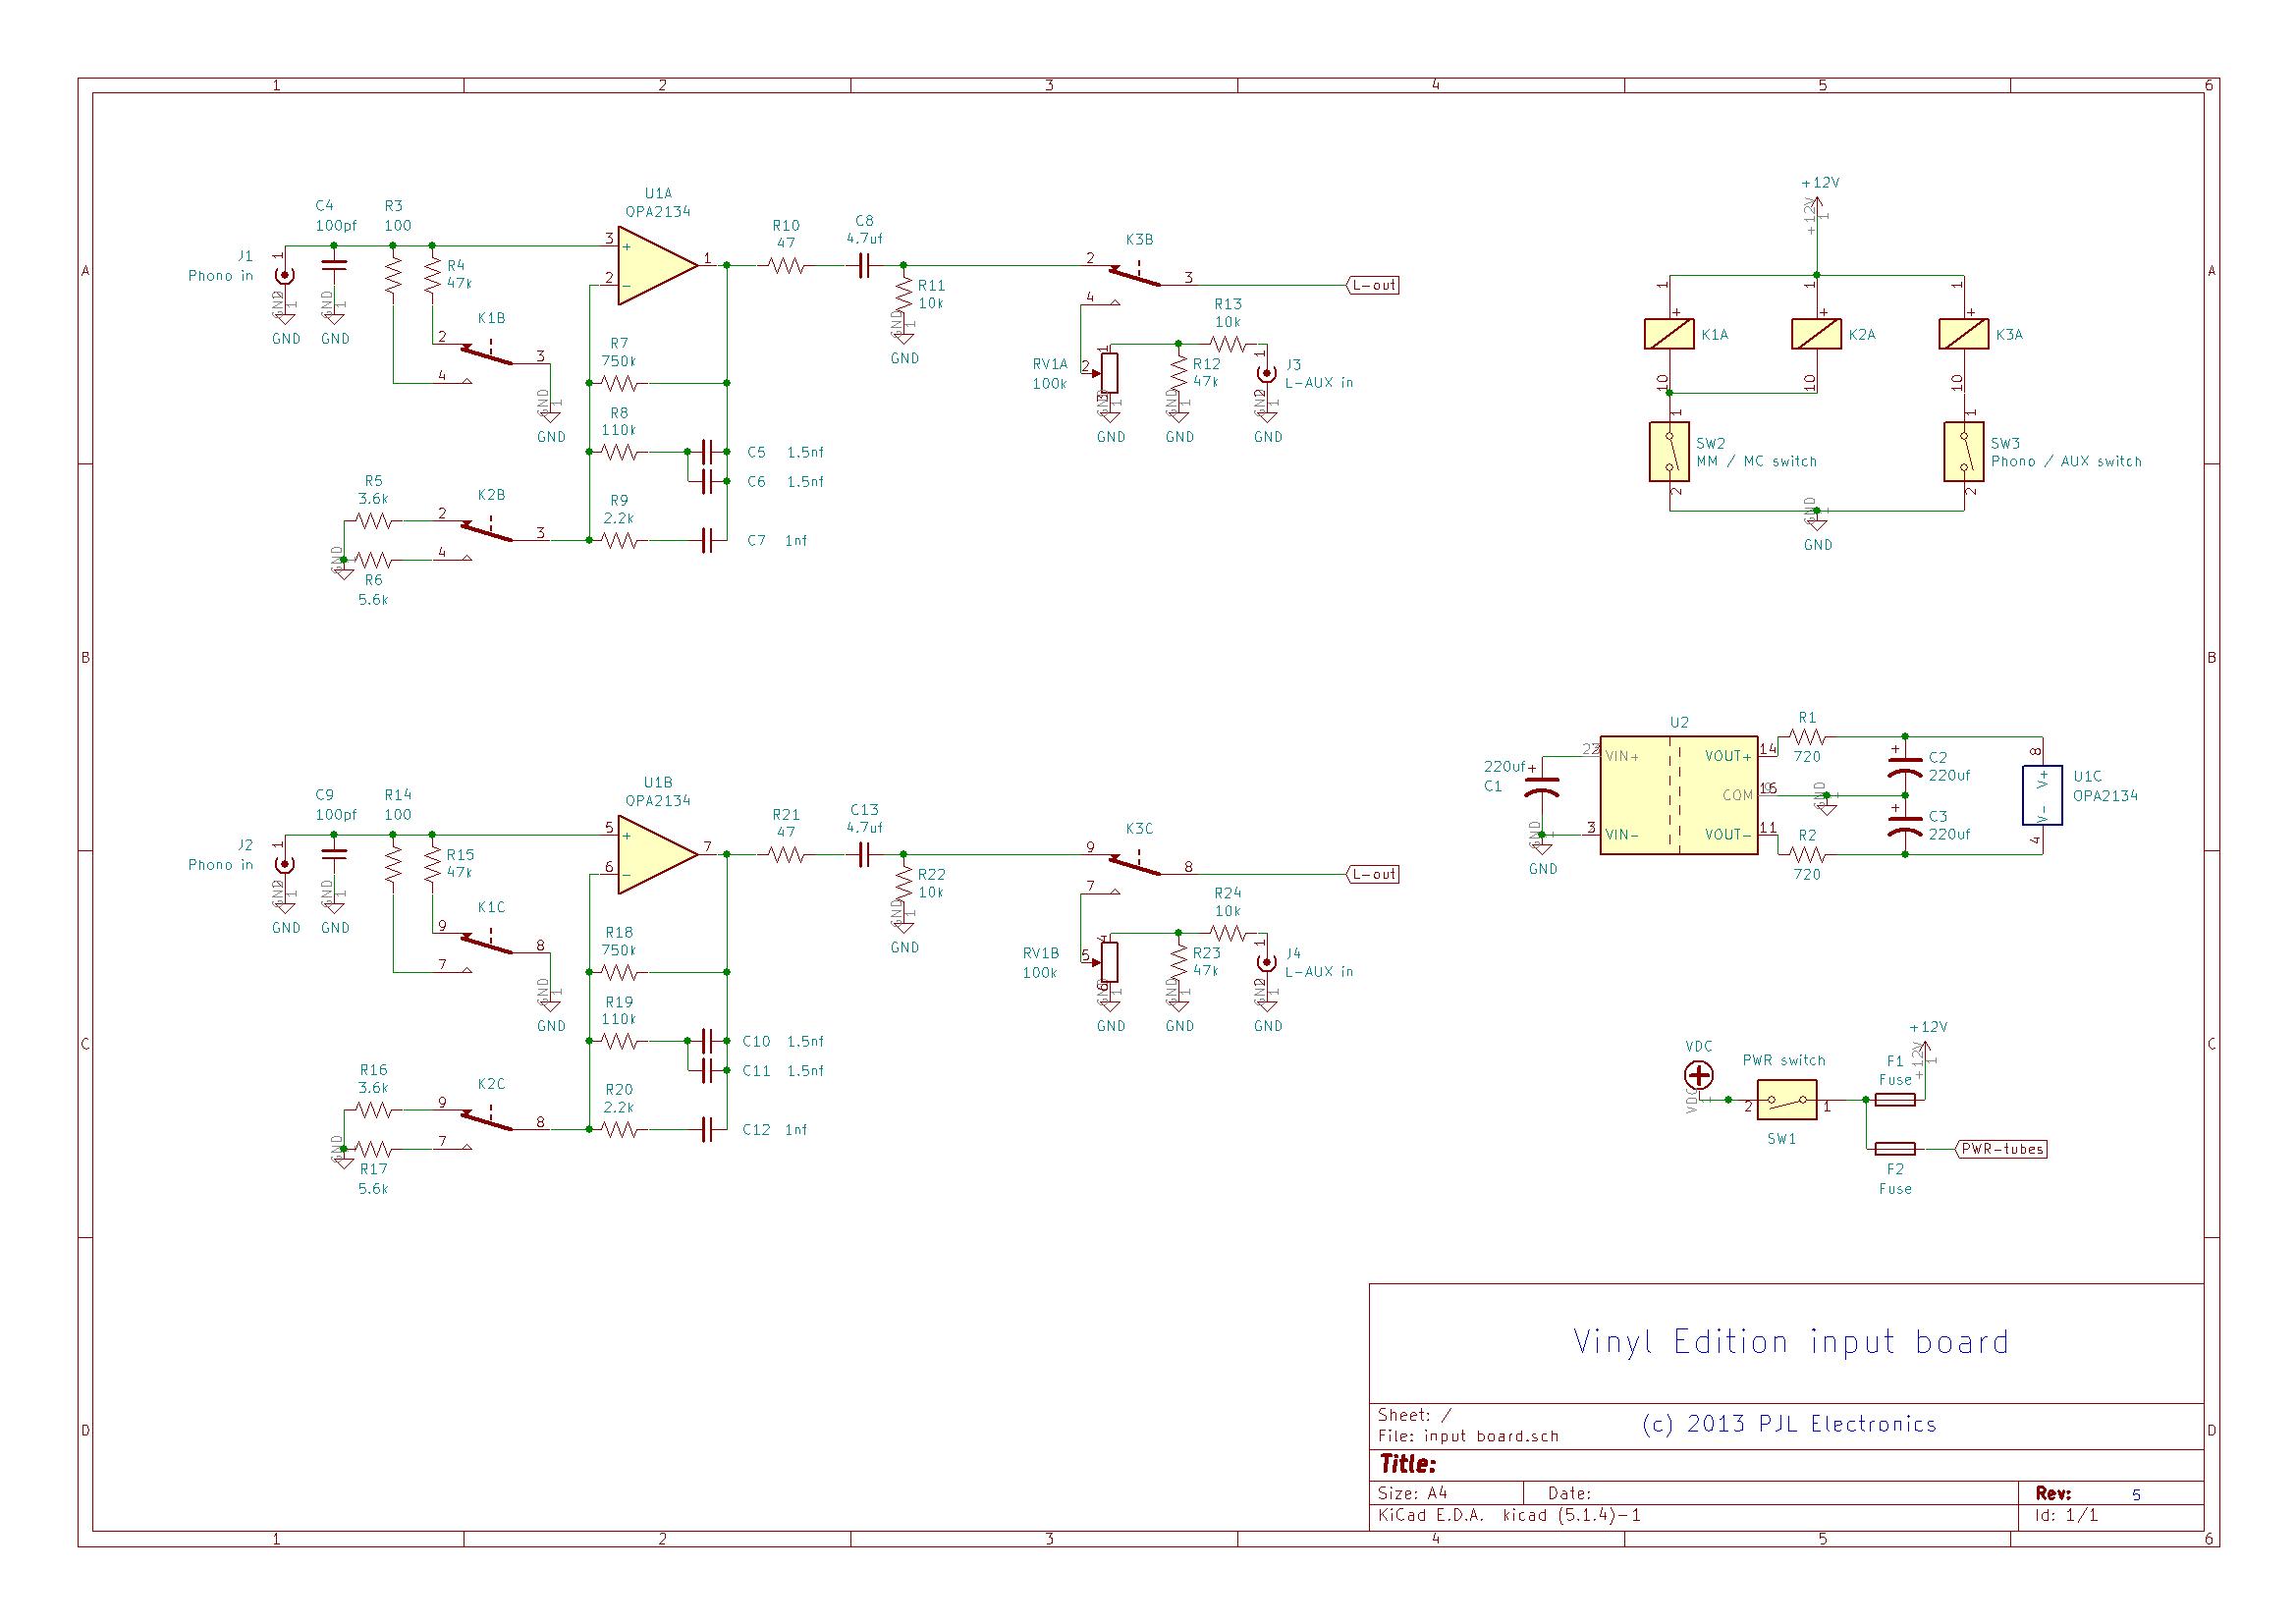 VE input board